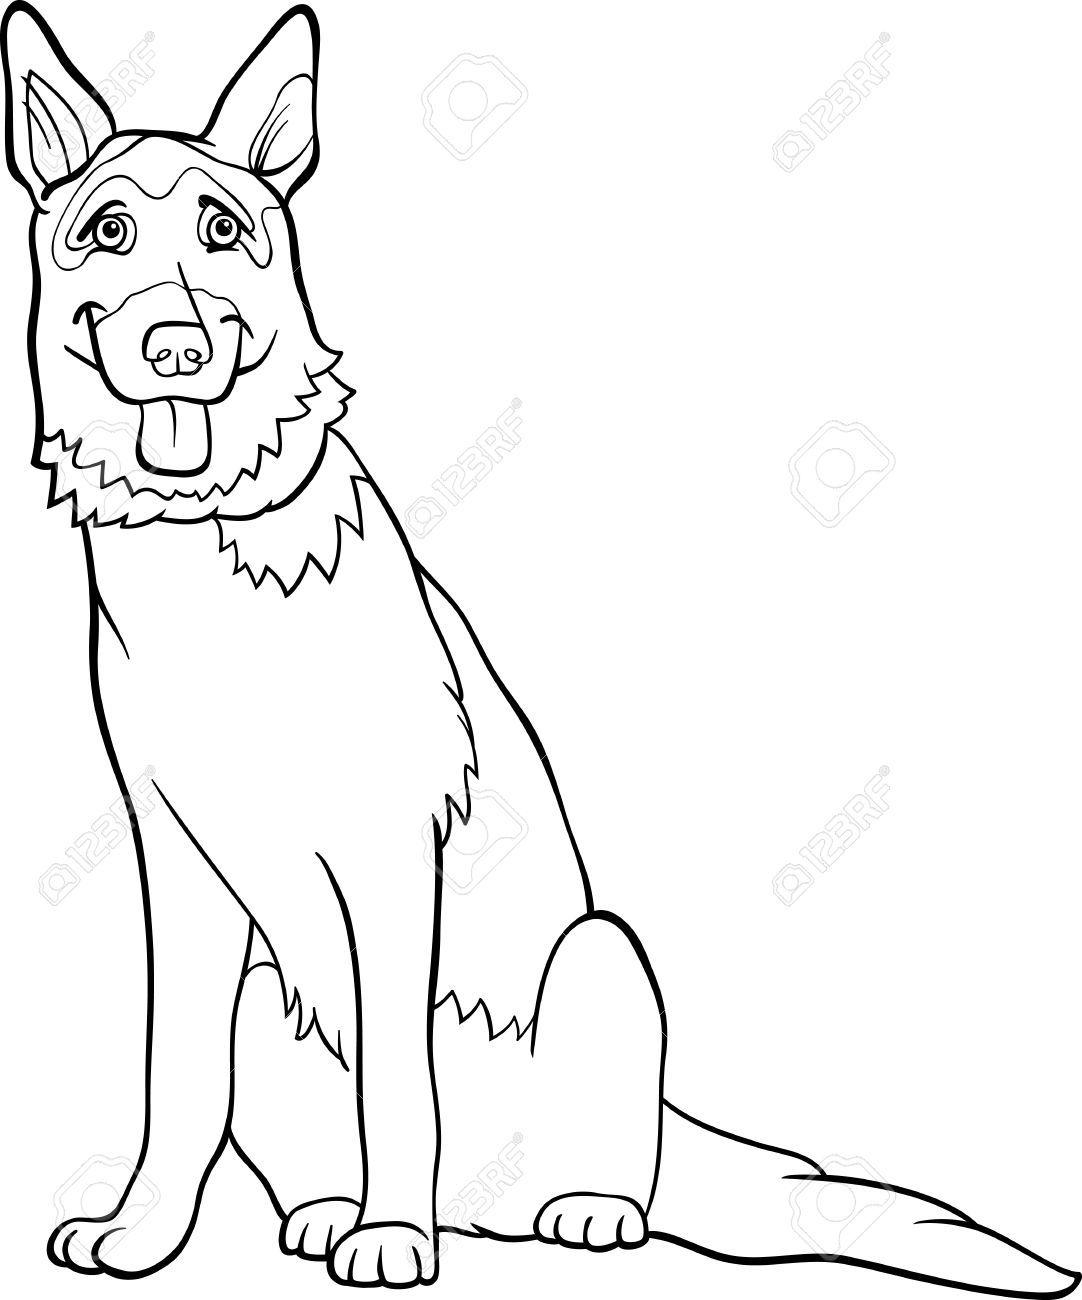 Раскраска собаки овчарки